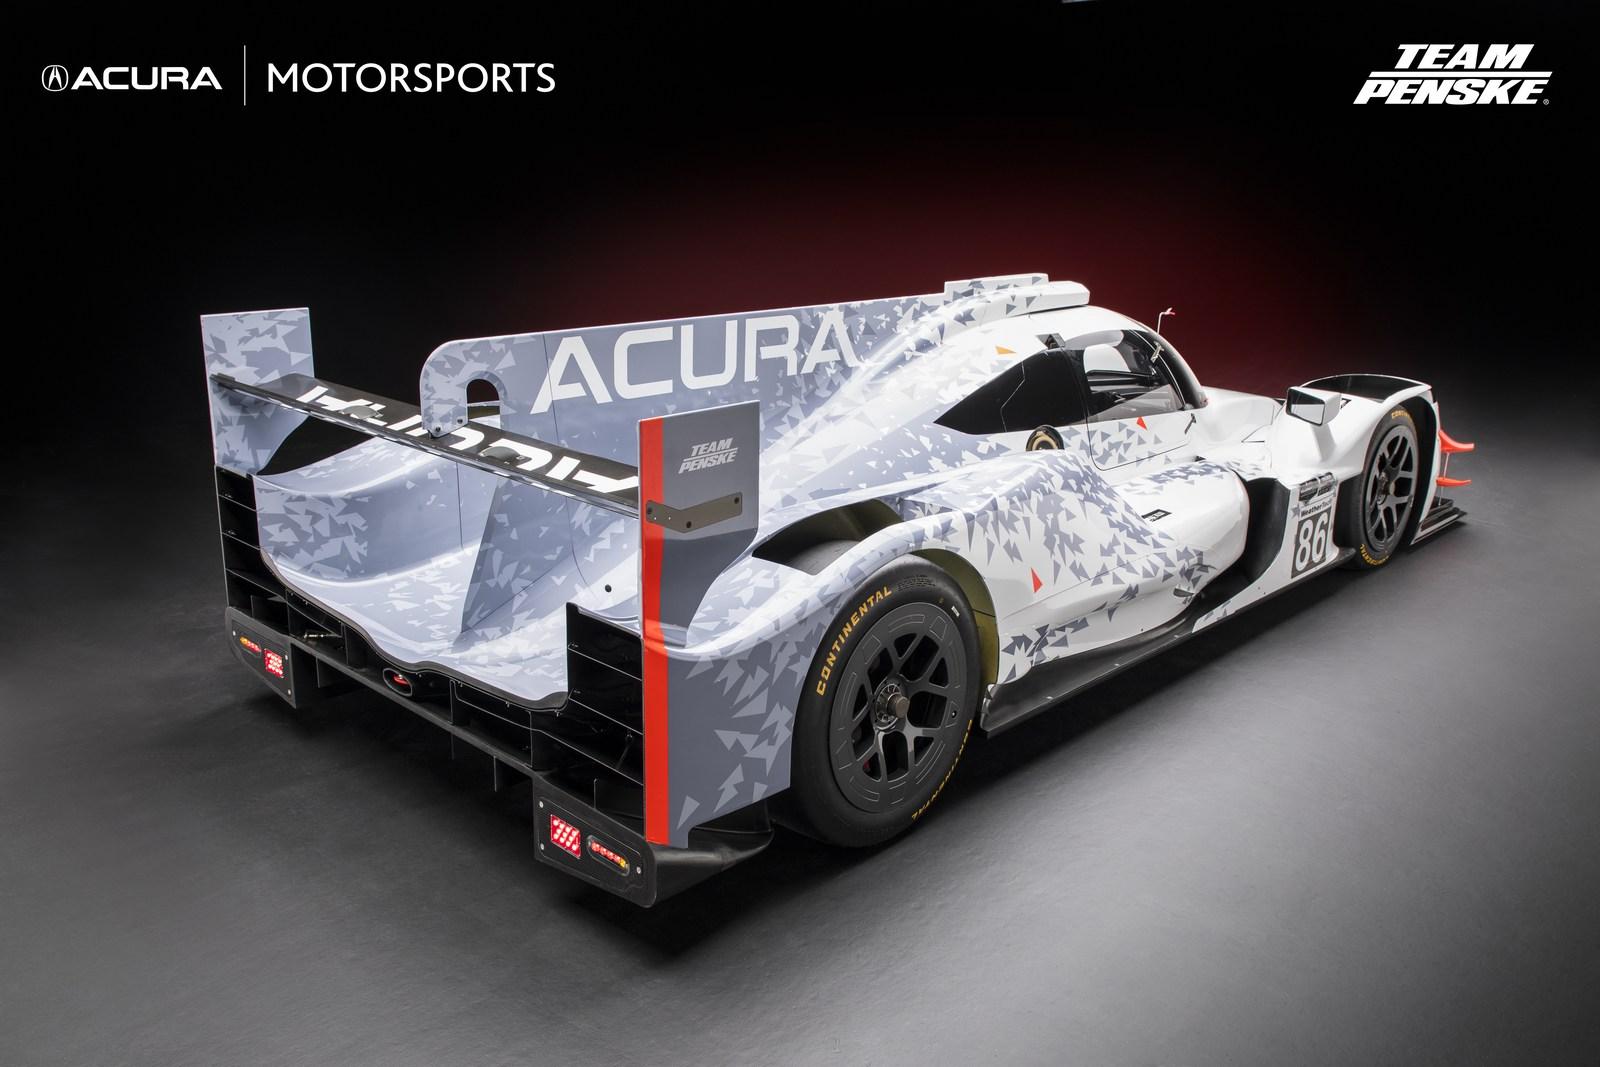 2018 Acura ARX-05 Looks Ready To Win Races - autoevolution